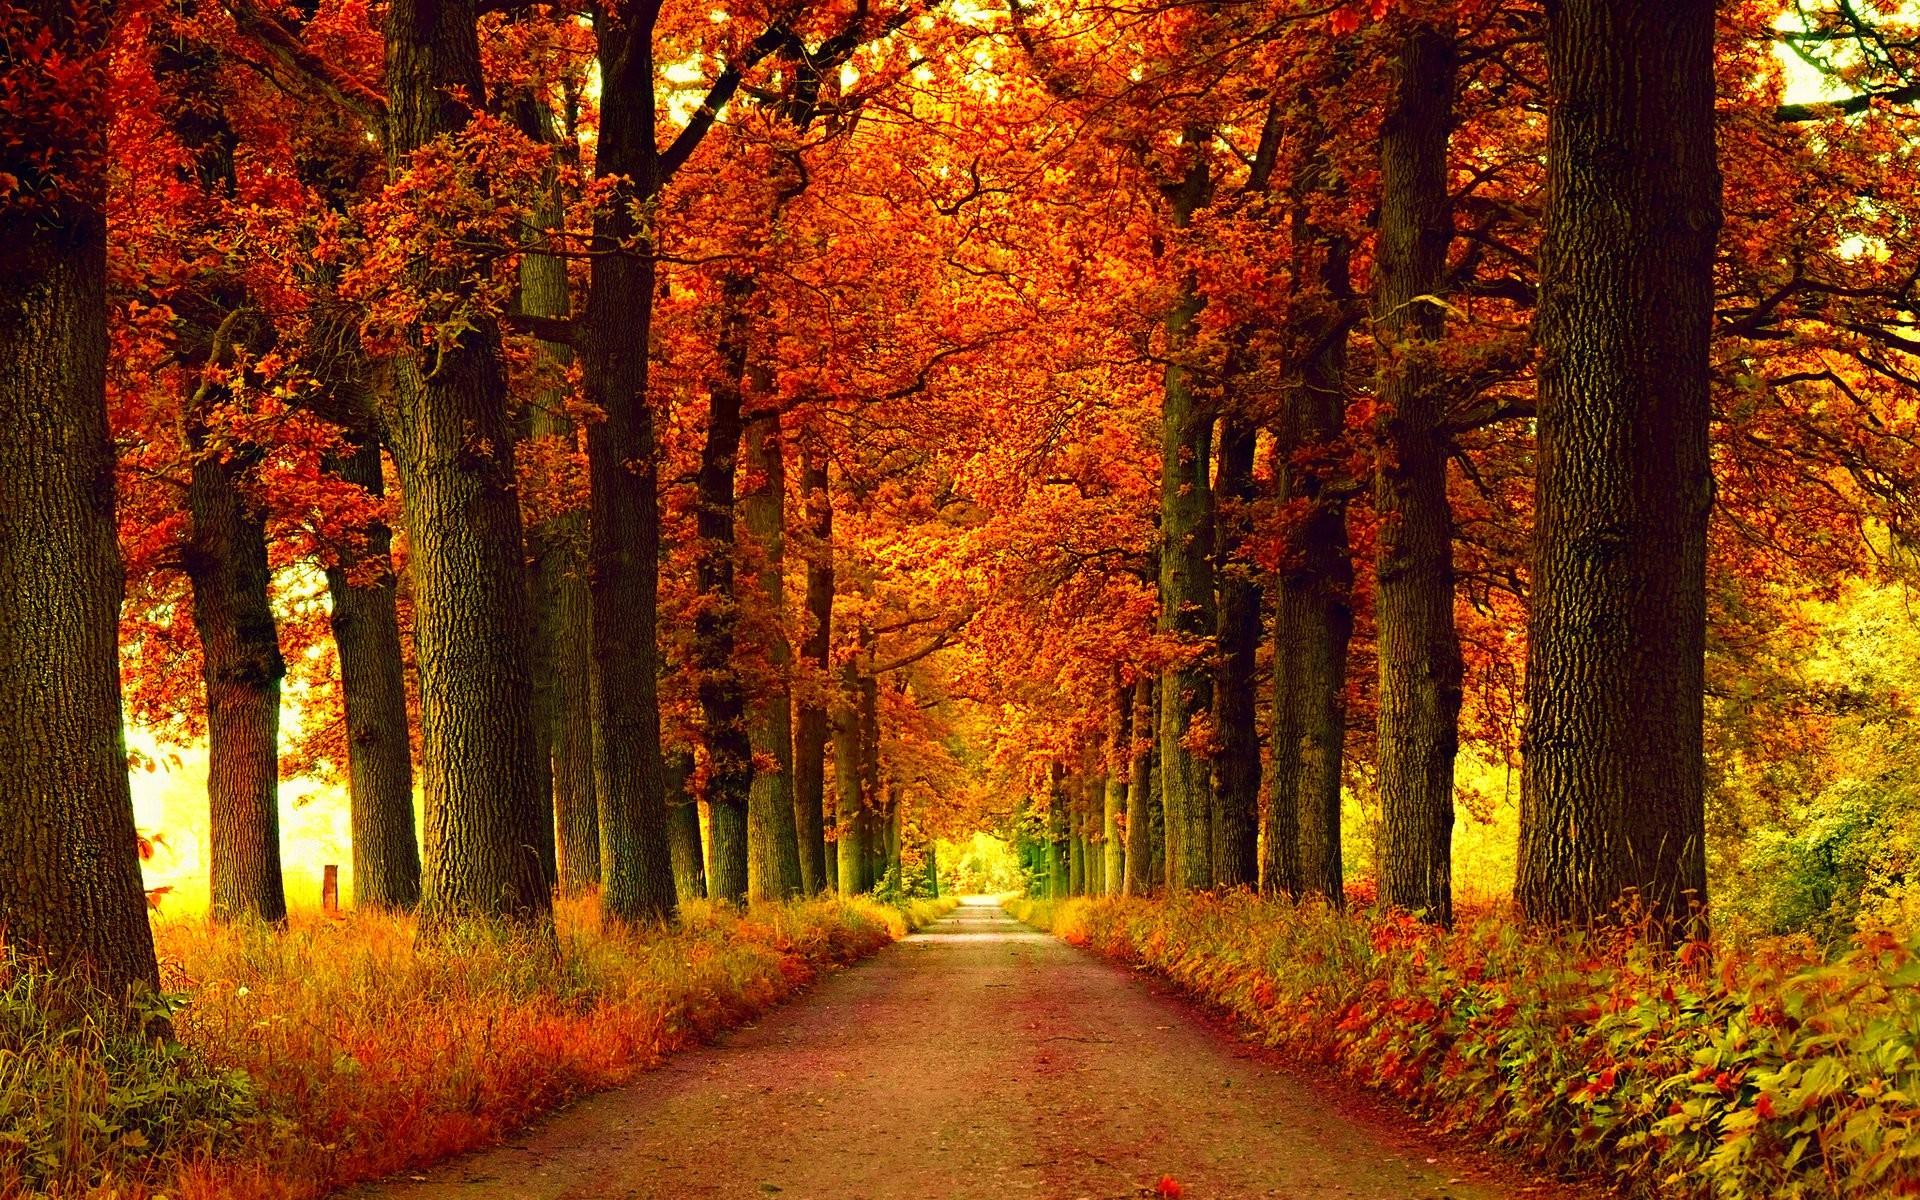 Free Computer Wallpaper Fall Leaves Free Photo Autumn Season Autumn Dry Fall Free